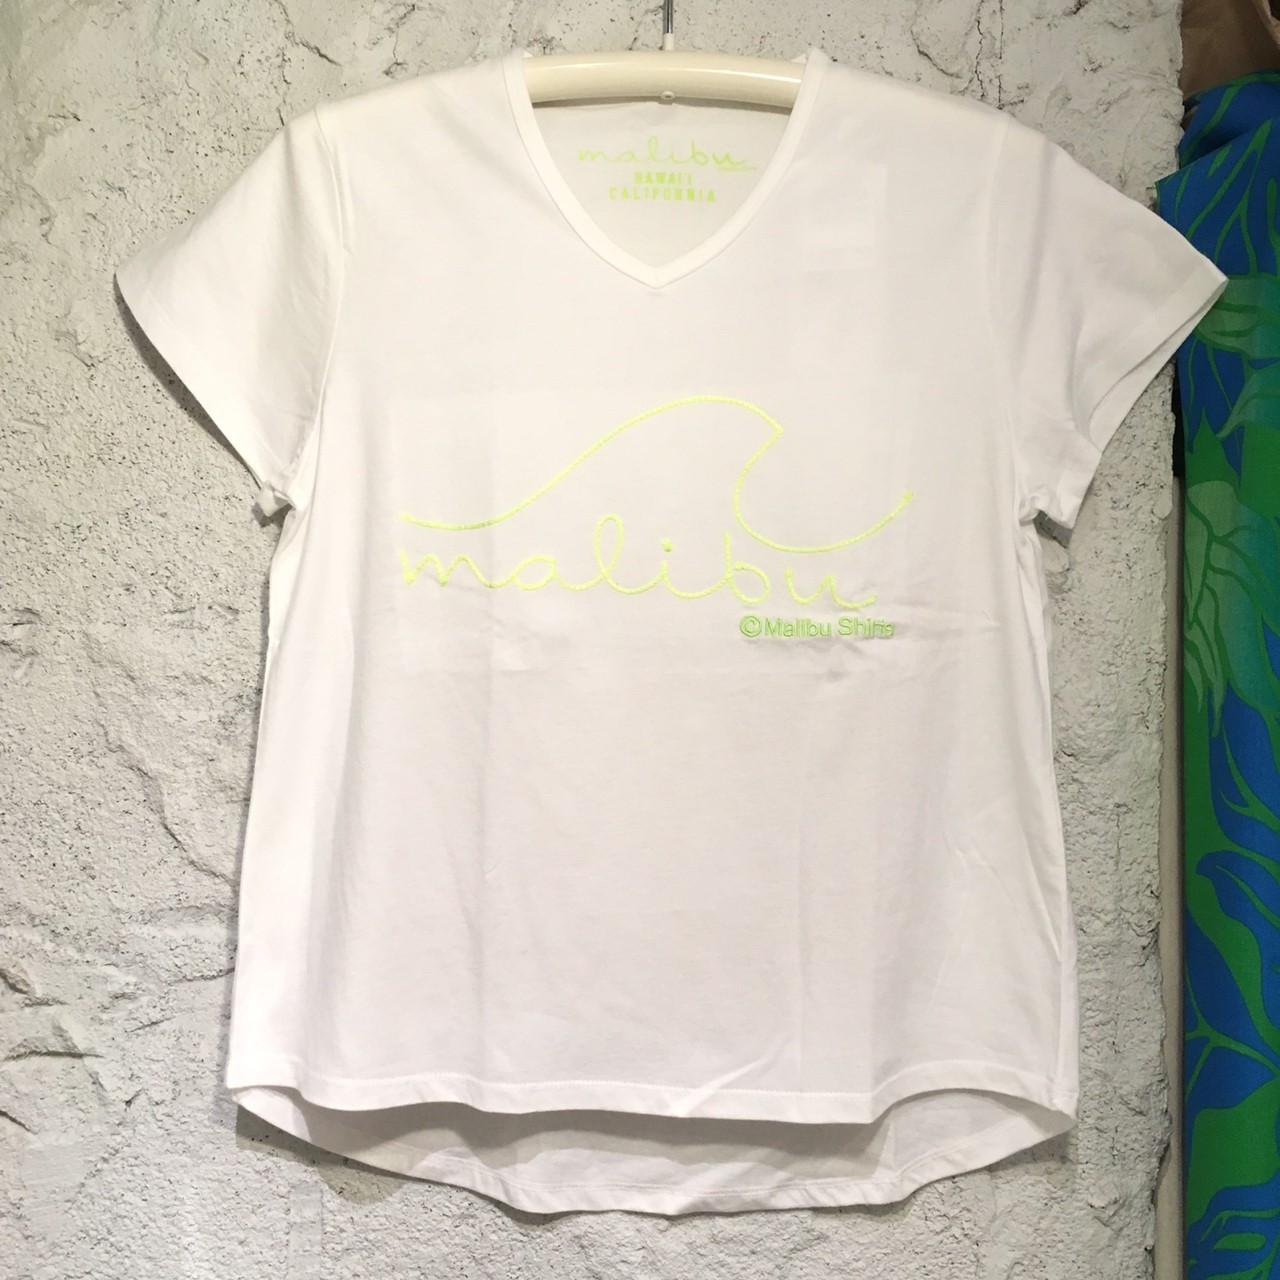 MALIBU SHIRTSチェーン刺繍VネックSSTシャツGR【アロハラバーズ】